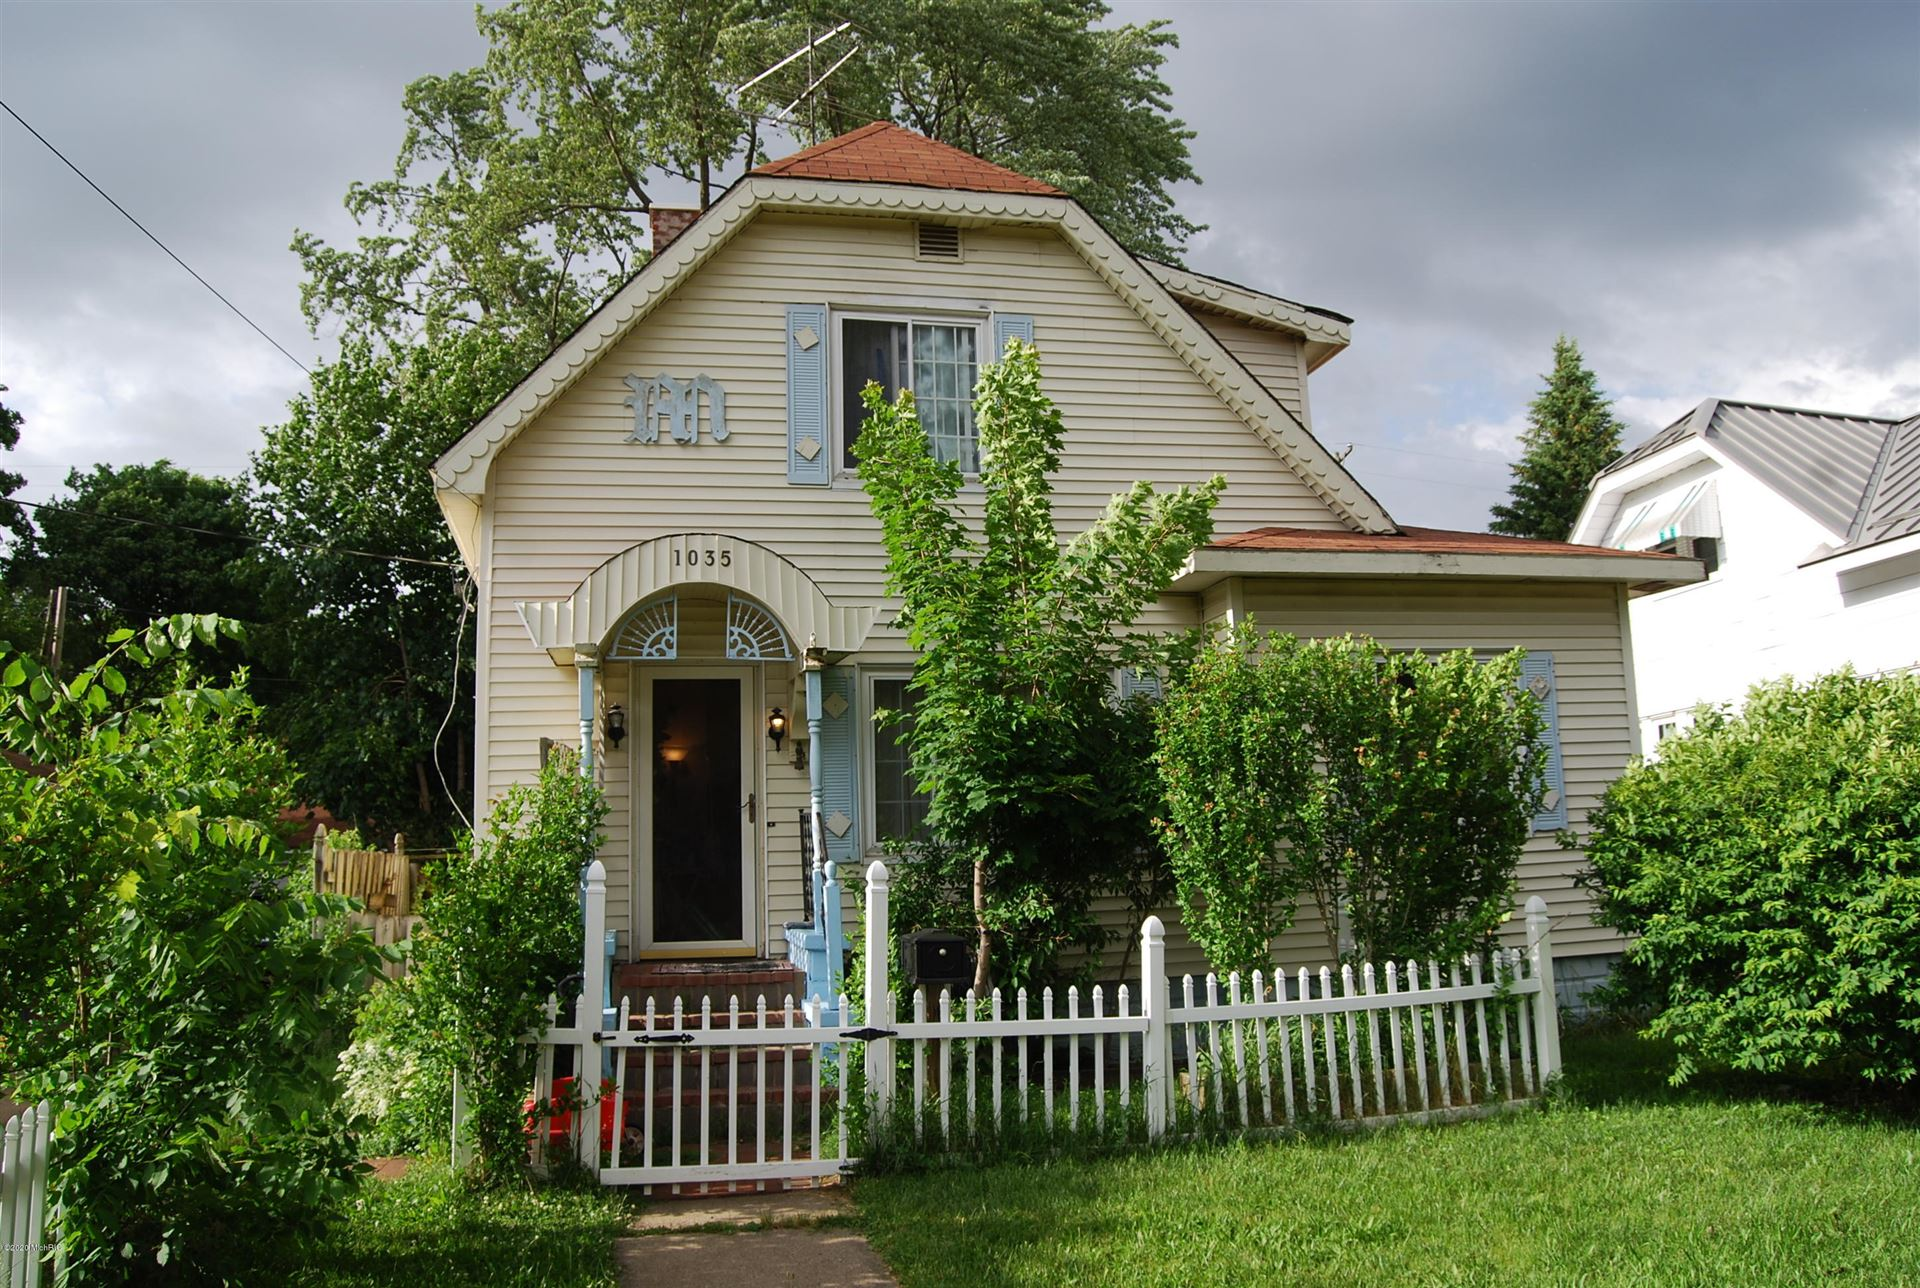 1035 Veto Street NW, Grand Rapids, MI 49504 - #: 20025820